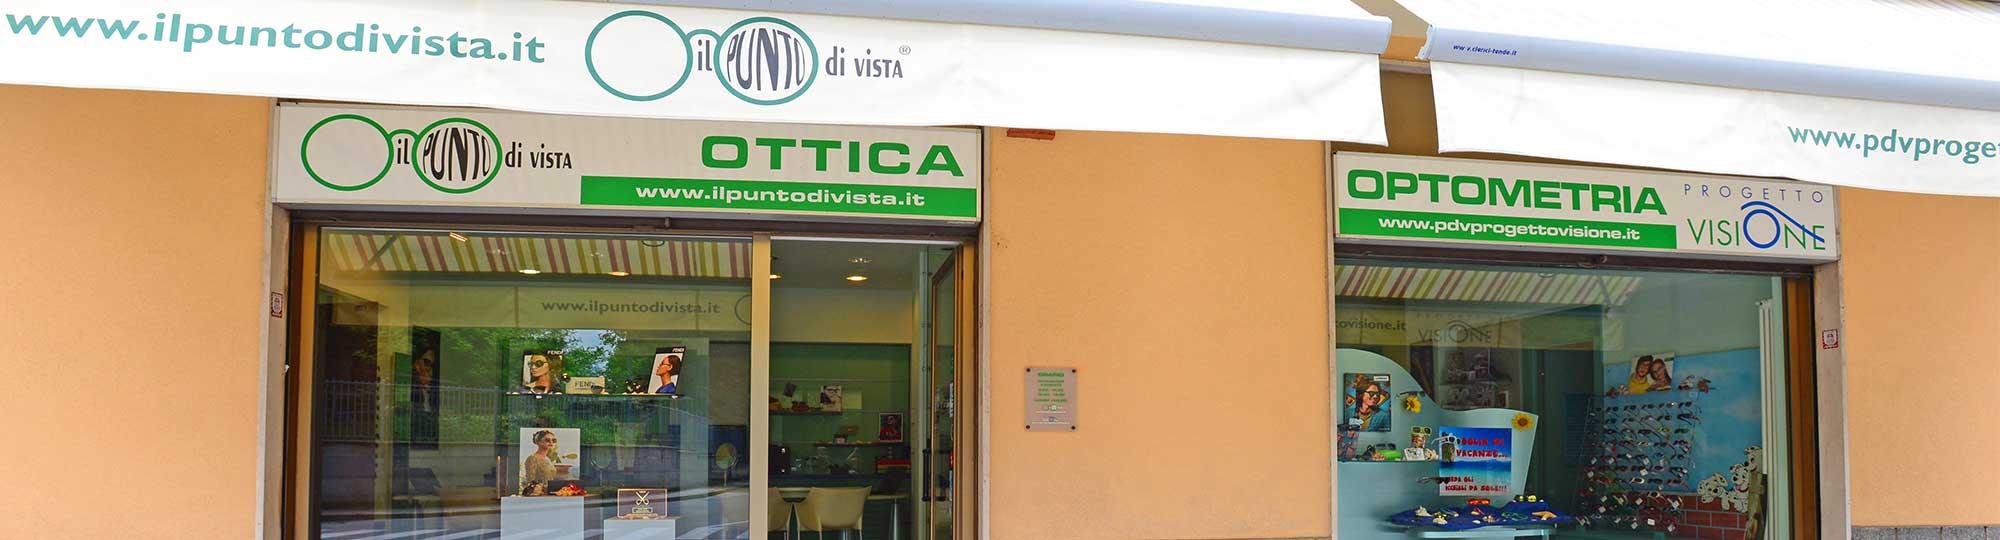 Immagine Sede Via Cavour - Turate 1